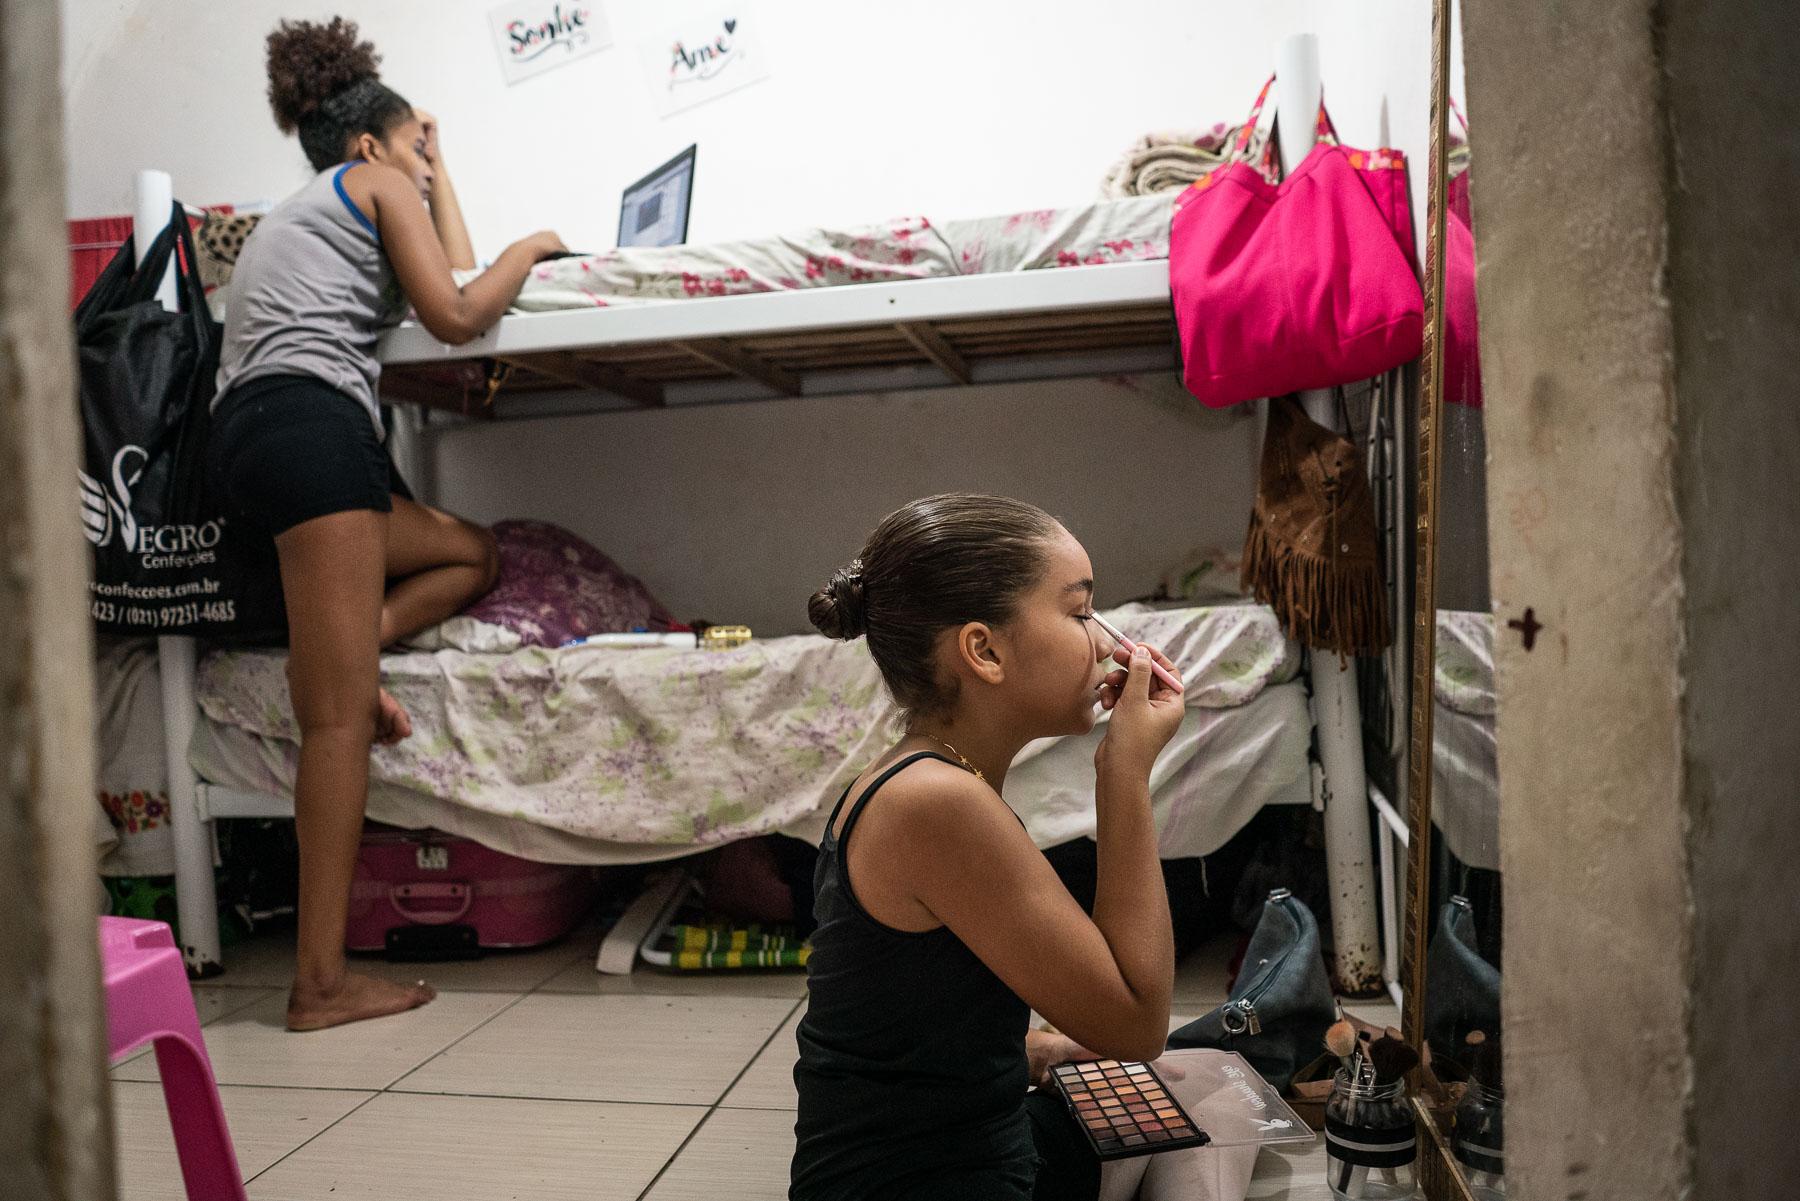 Maysa Aben-Athar, Top Student of Ballet Manguinhos